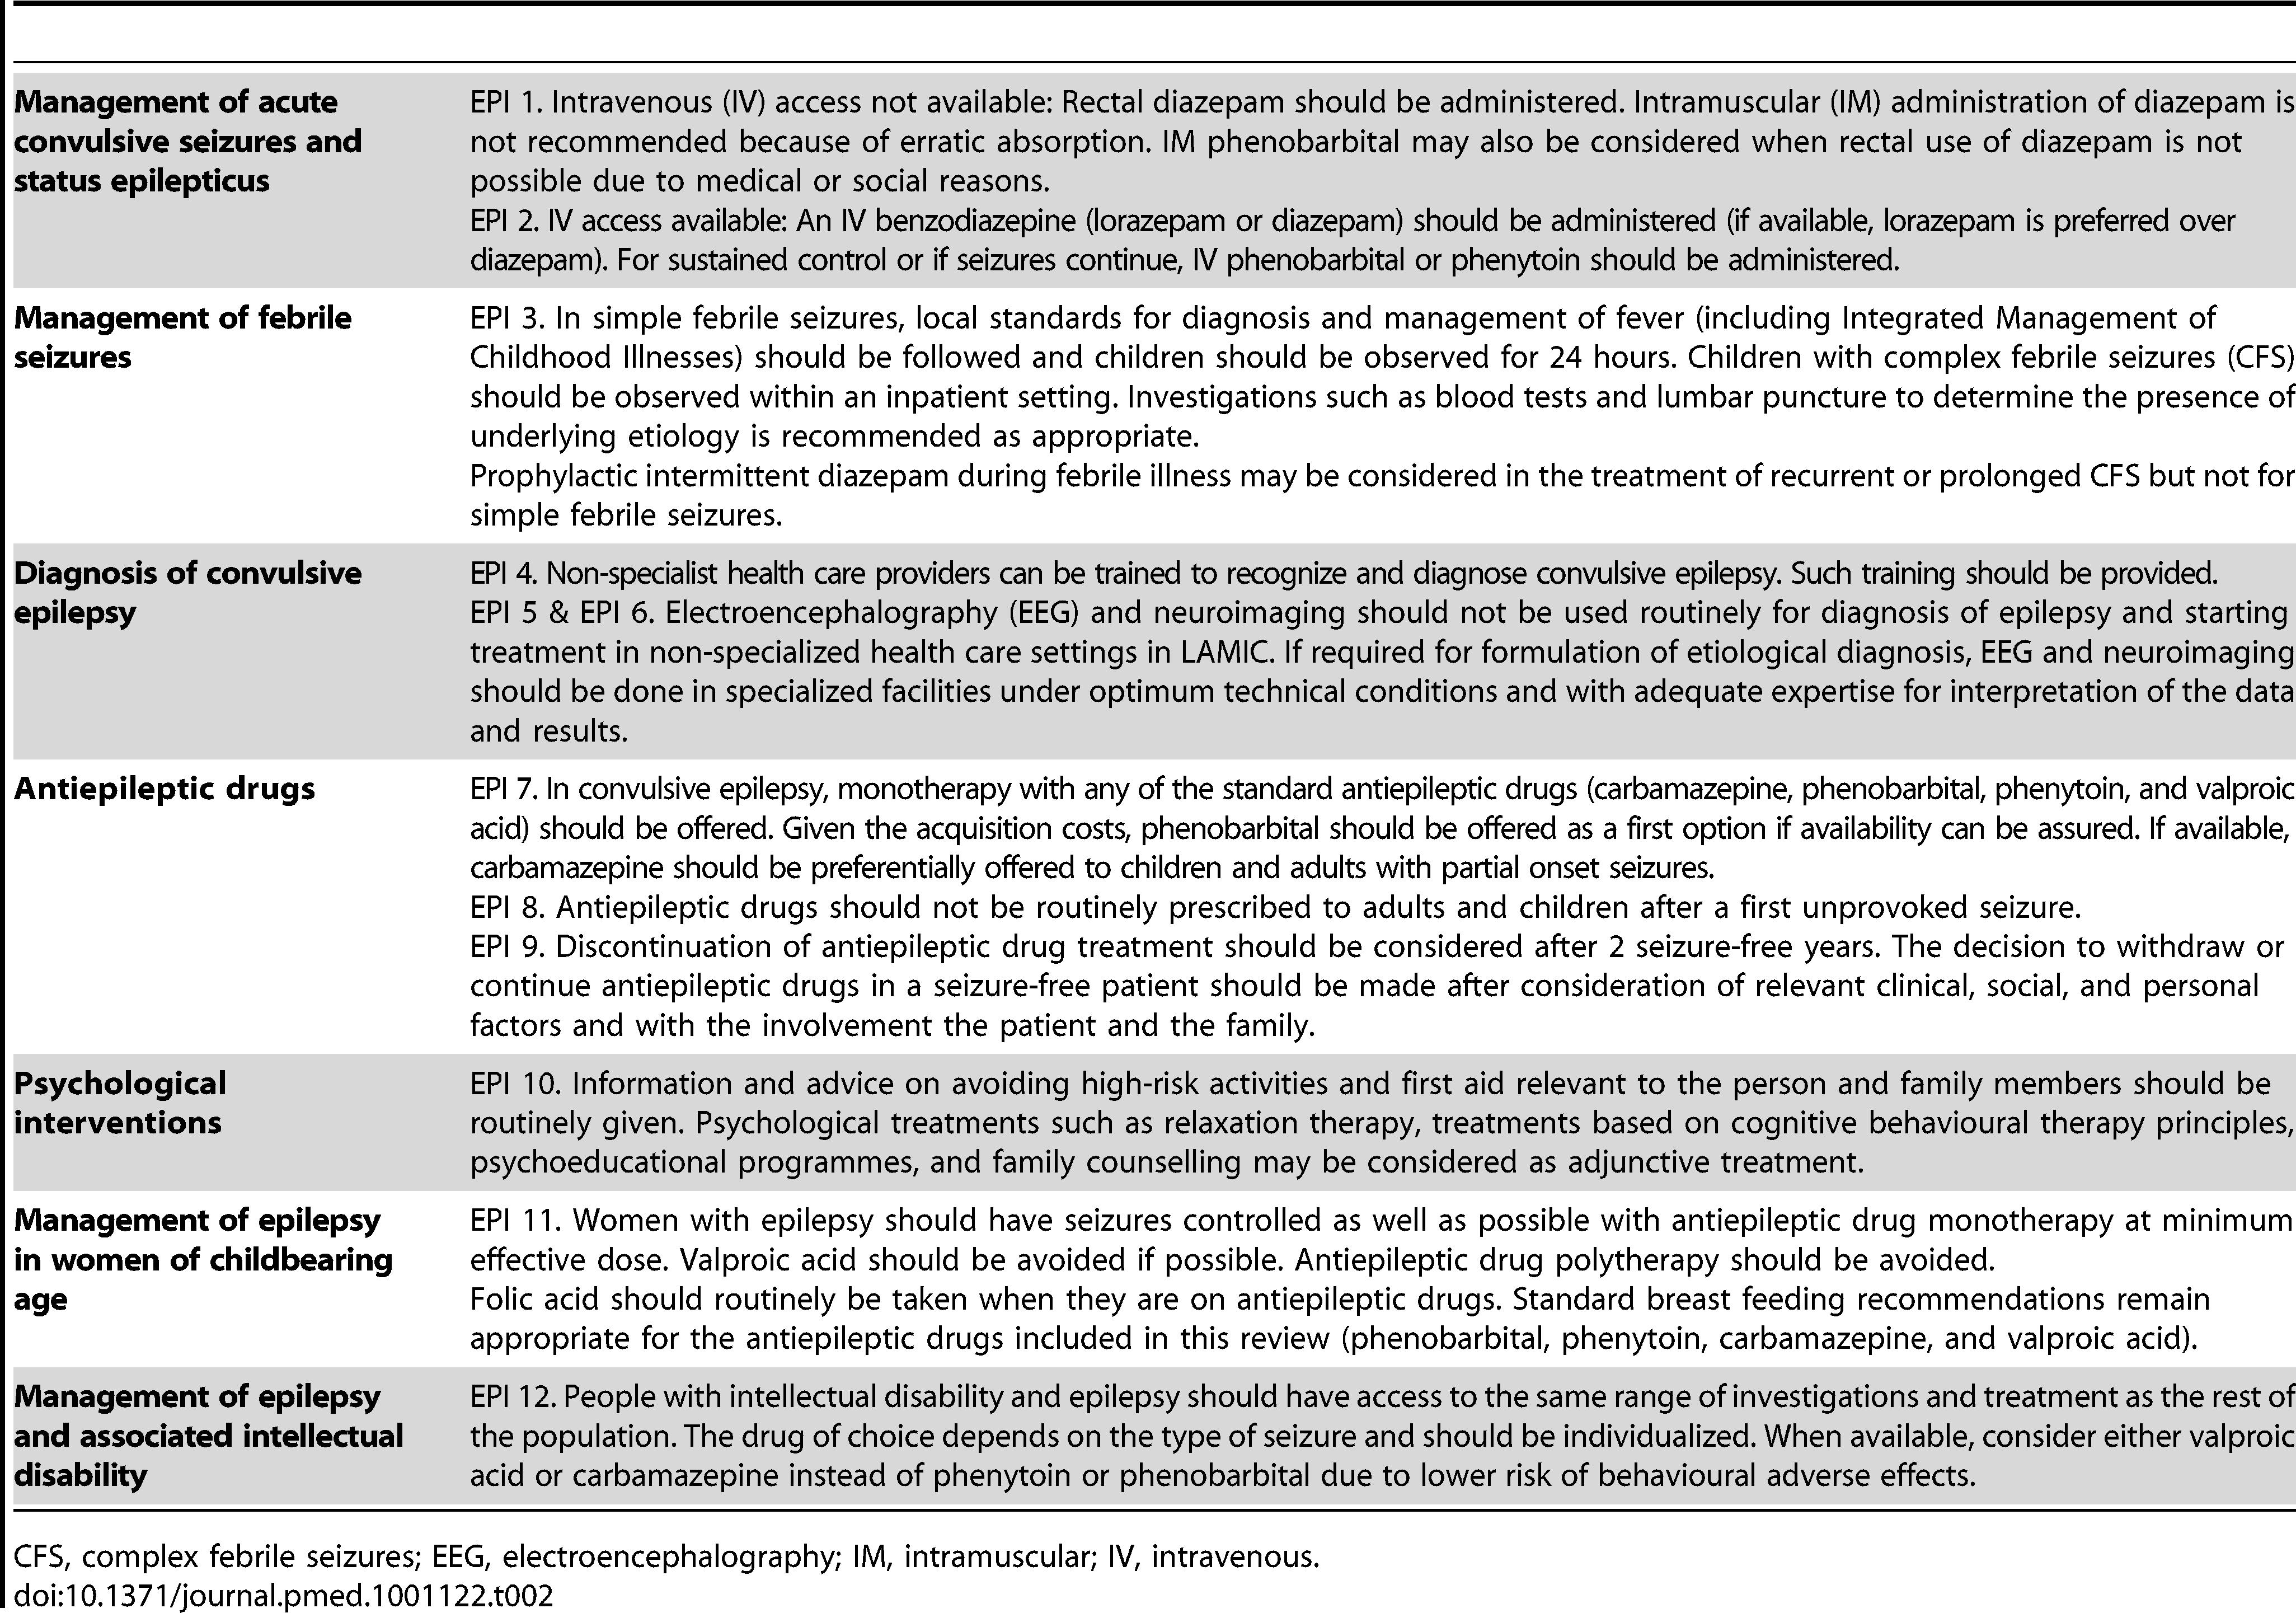 Abridged recommendations for epilepsy and seizures (EPI 1–12).